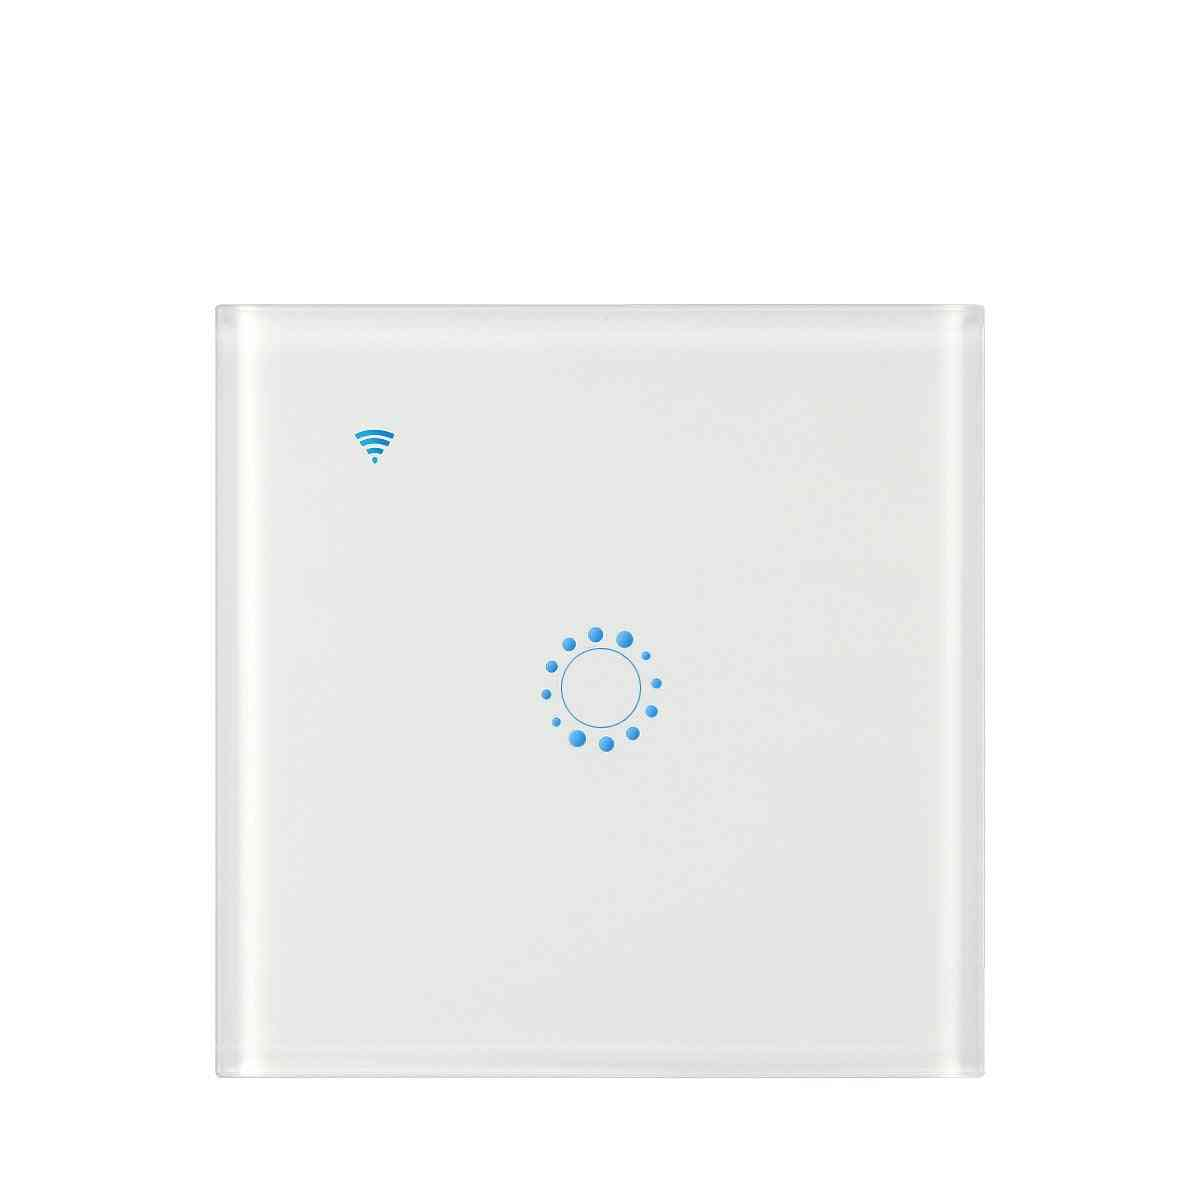 Wifi Electrical Blinds Switch Eu Plug